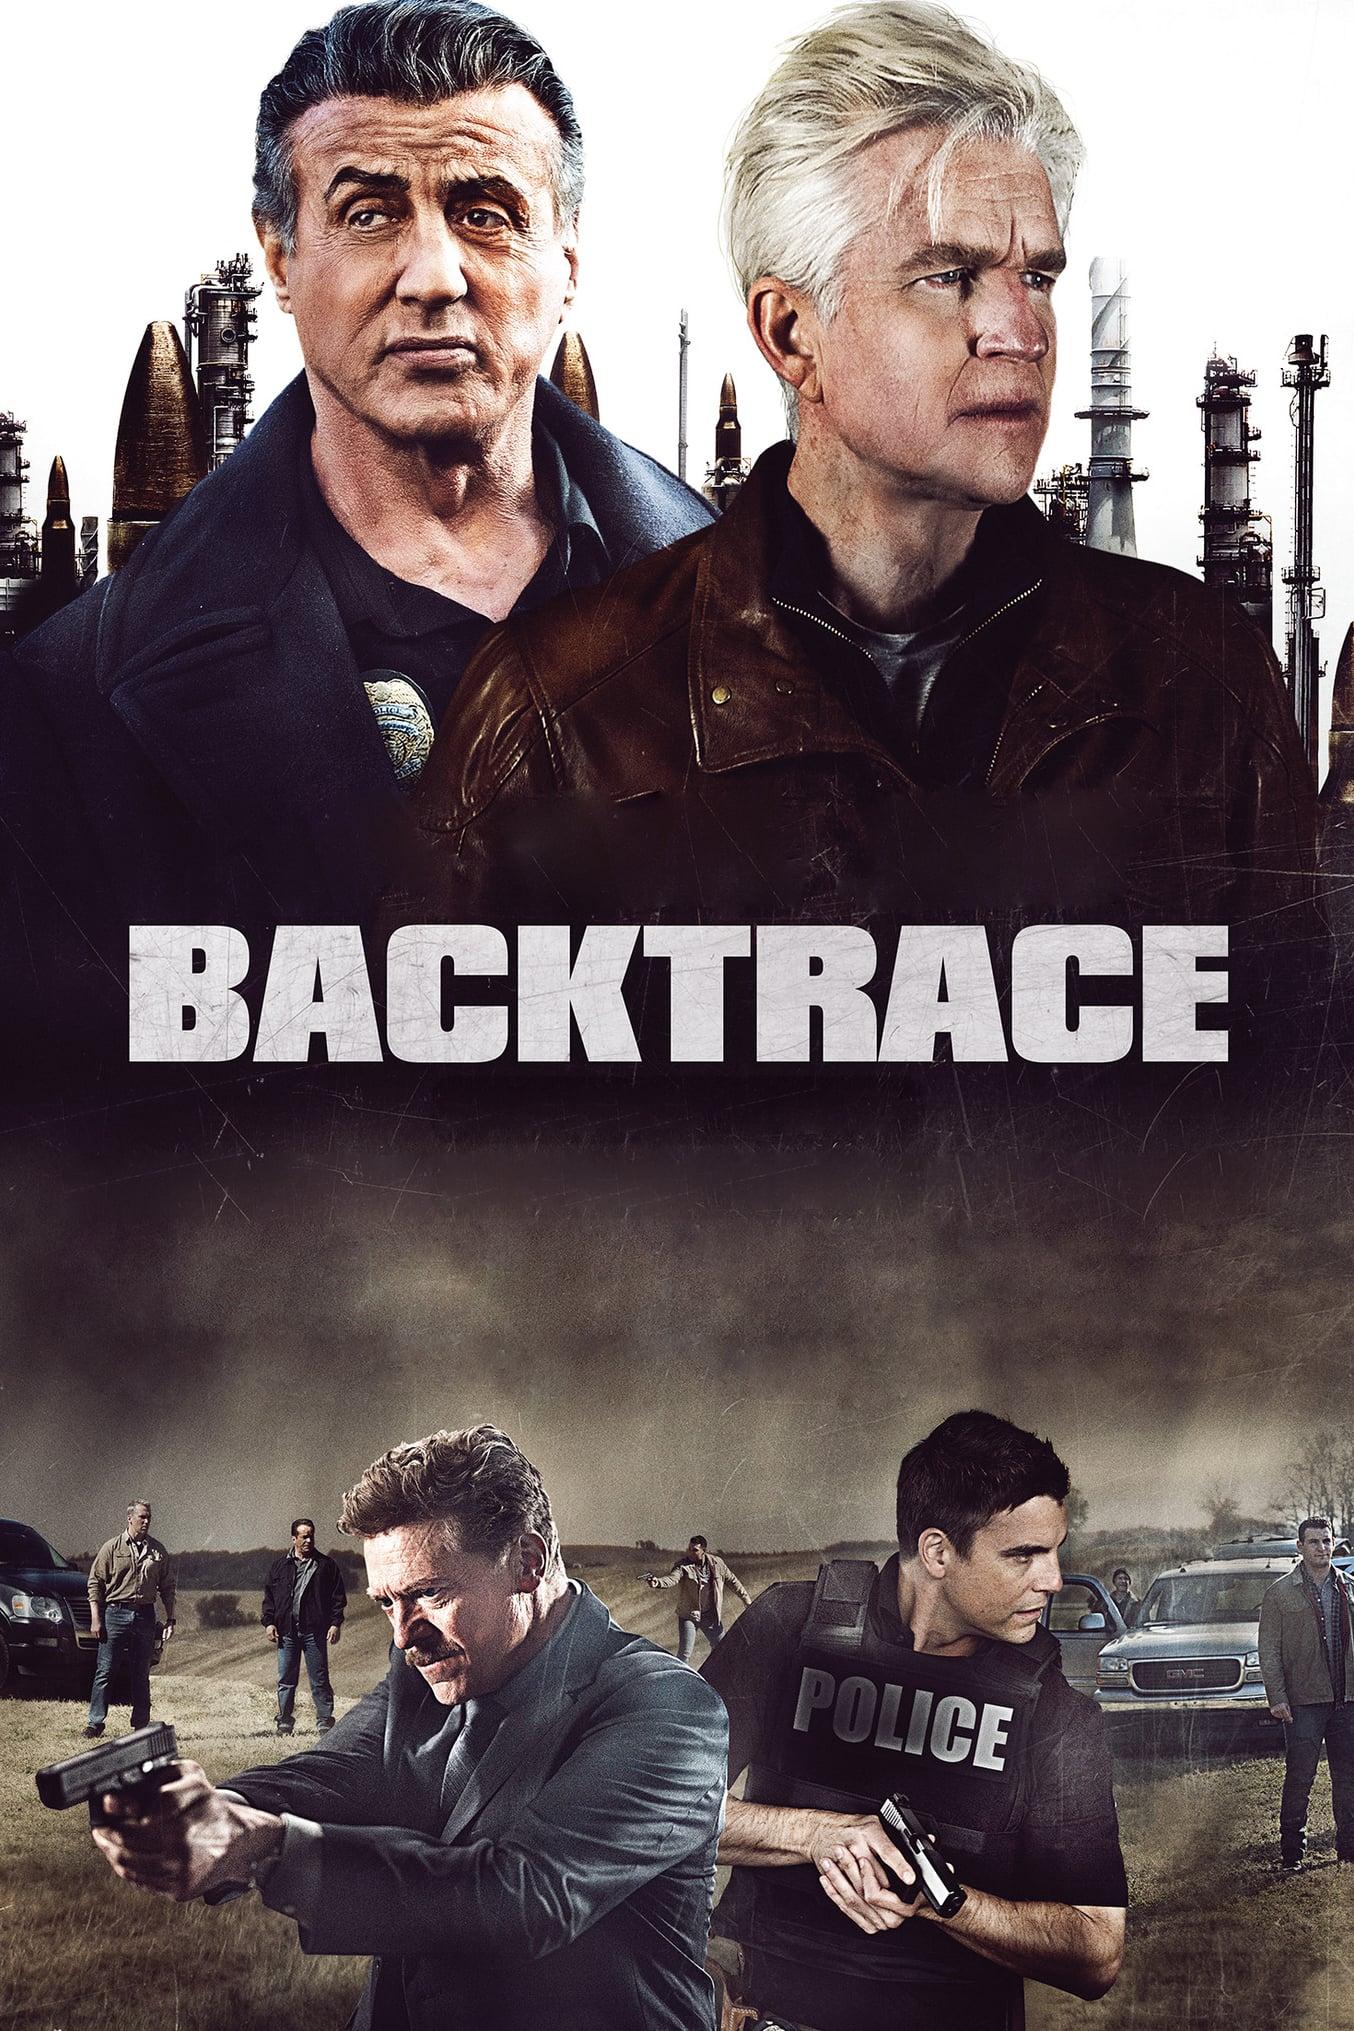 فیلم ردگیری – Backtrace 2018